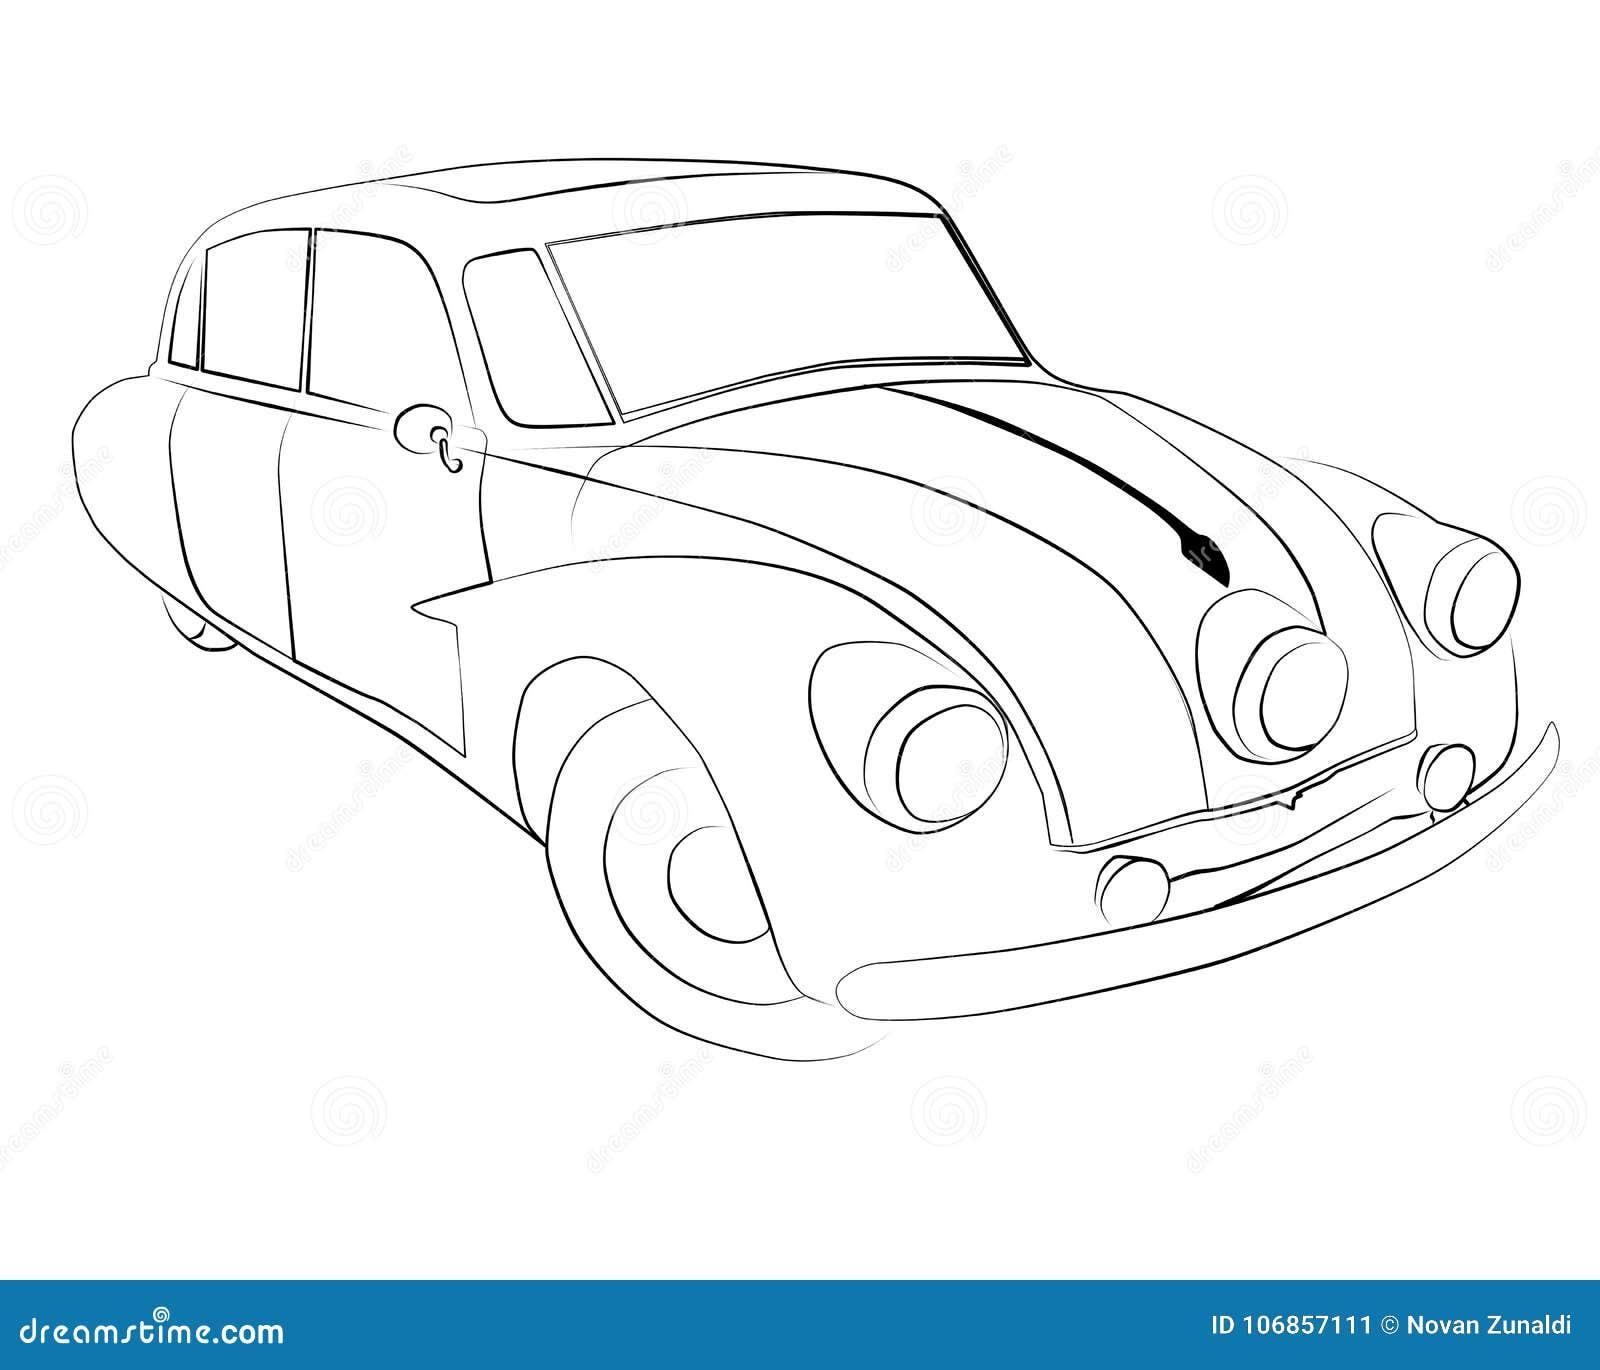 1941 Tatra T87: The Jalopnik Classic Review